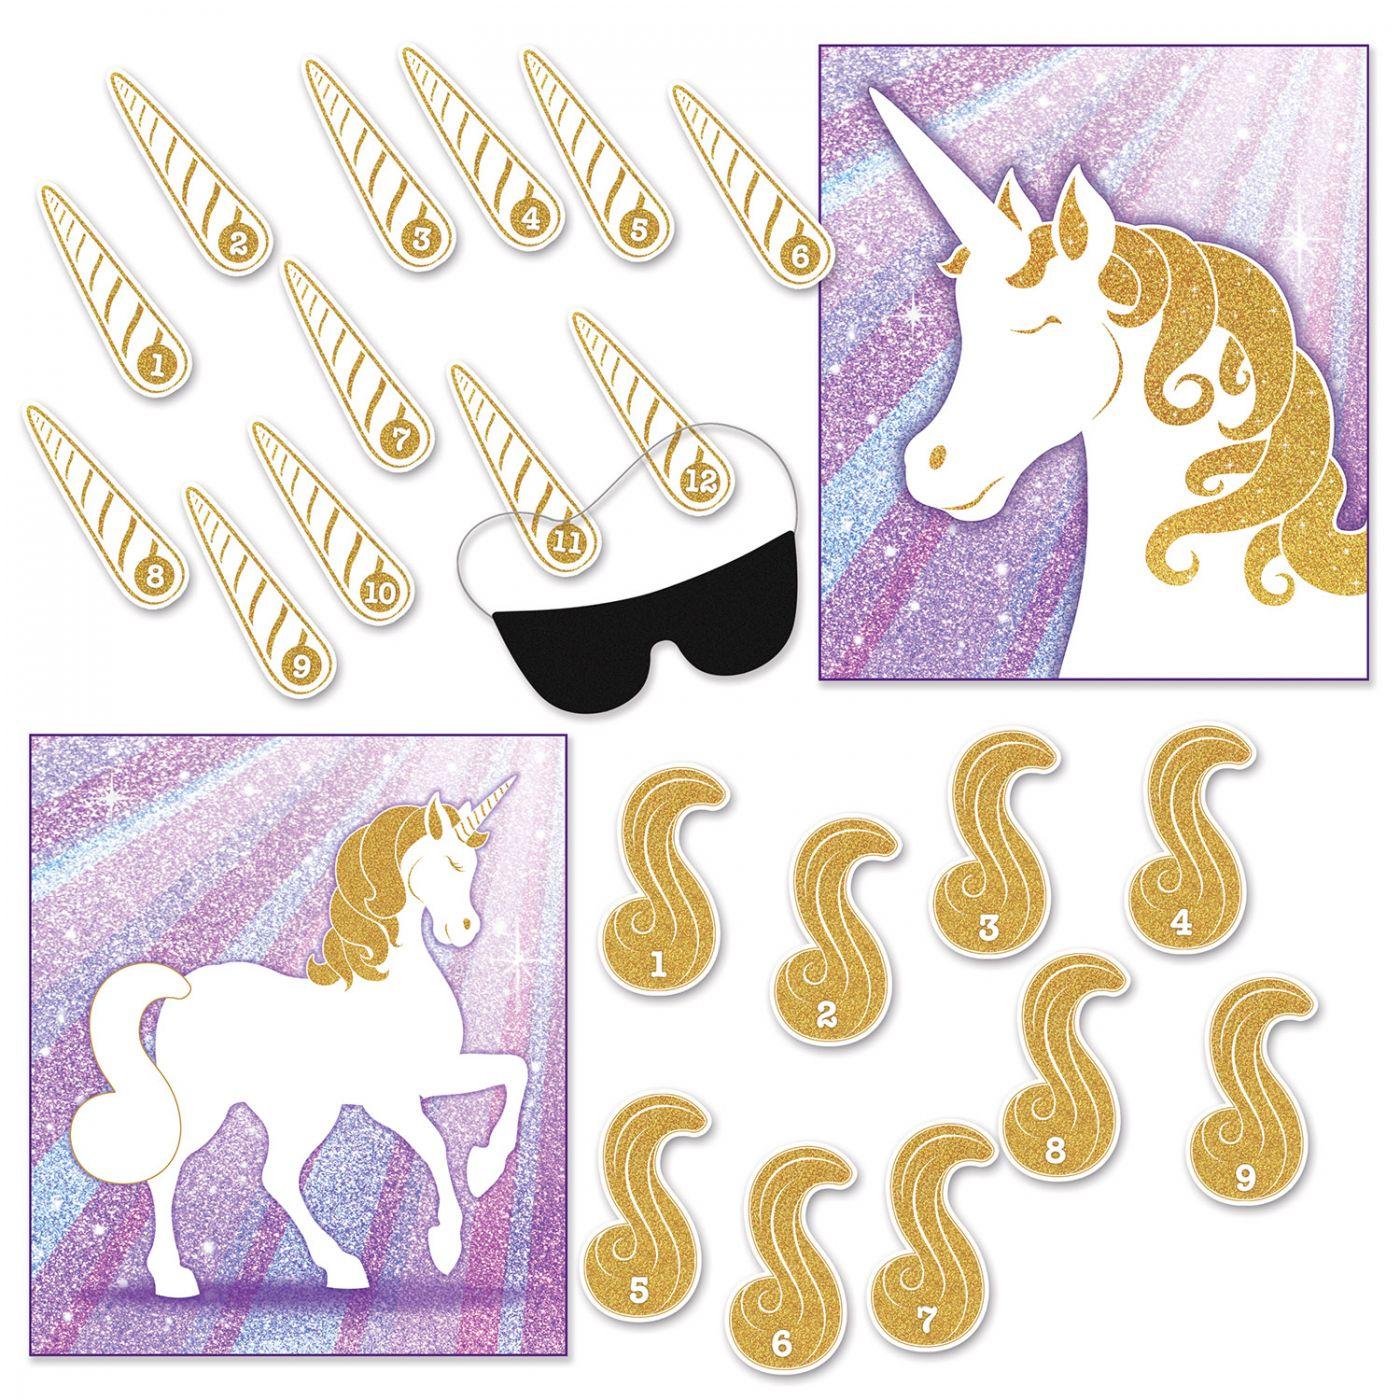 Unicorn Party Games (24) image